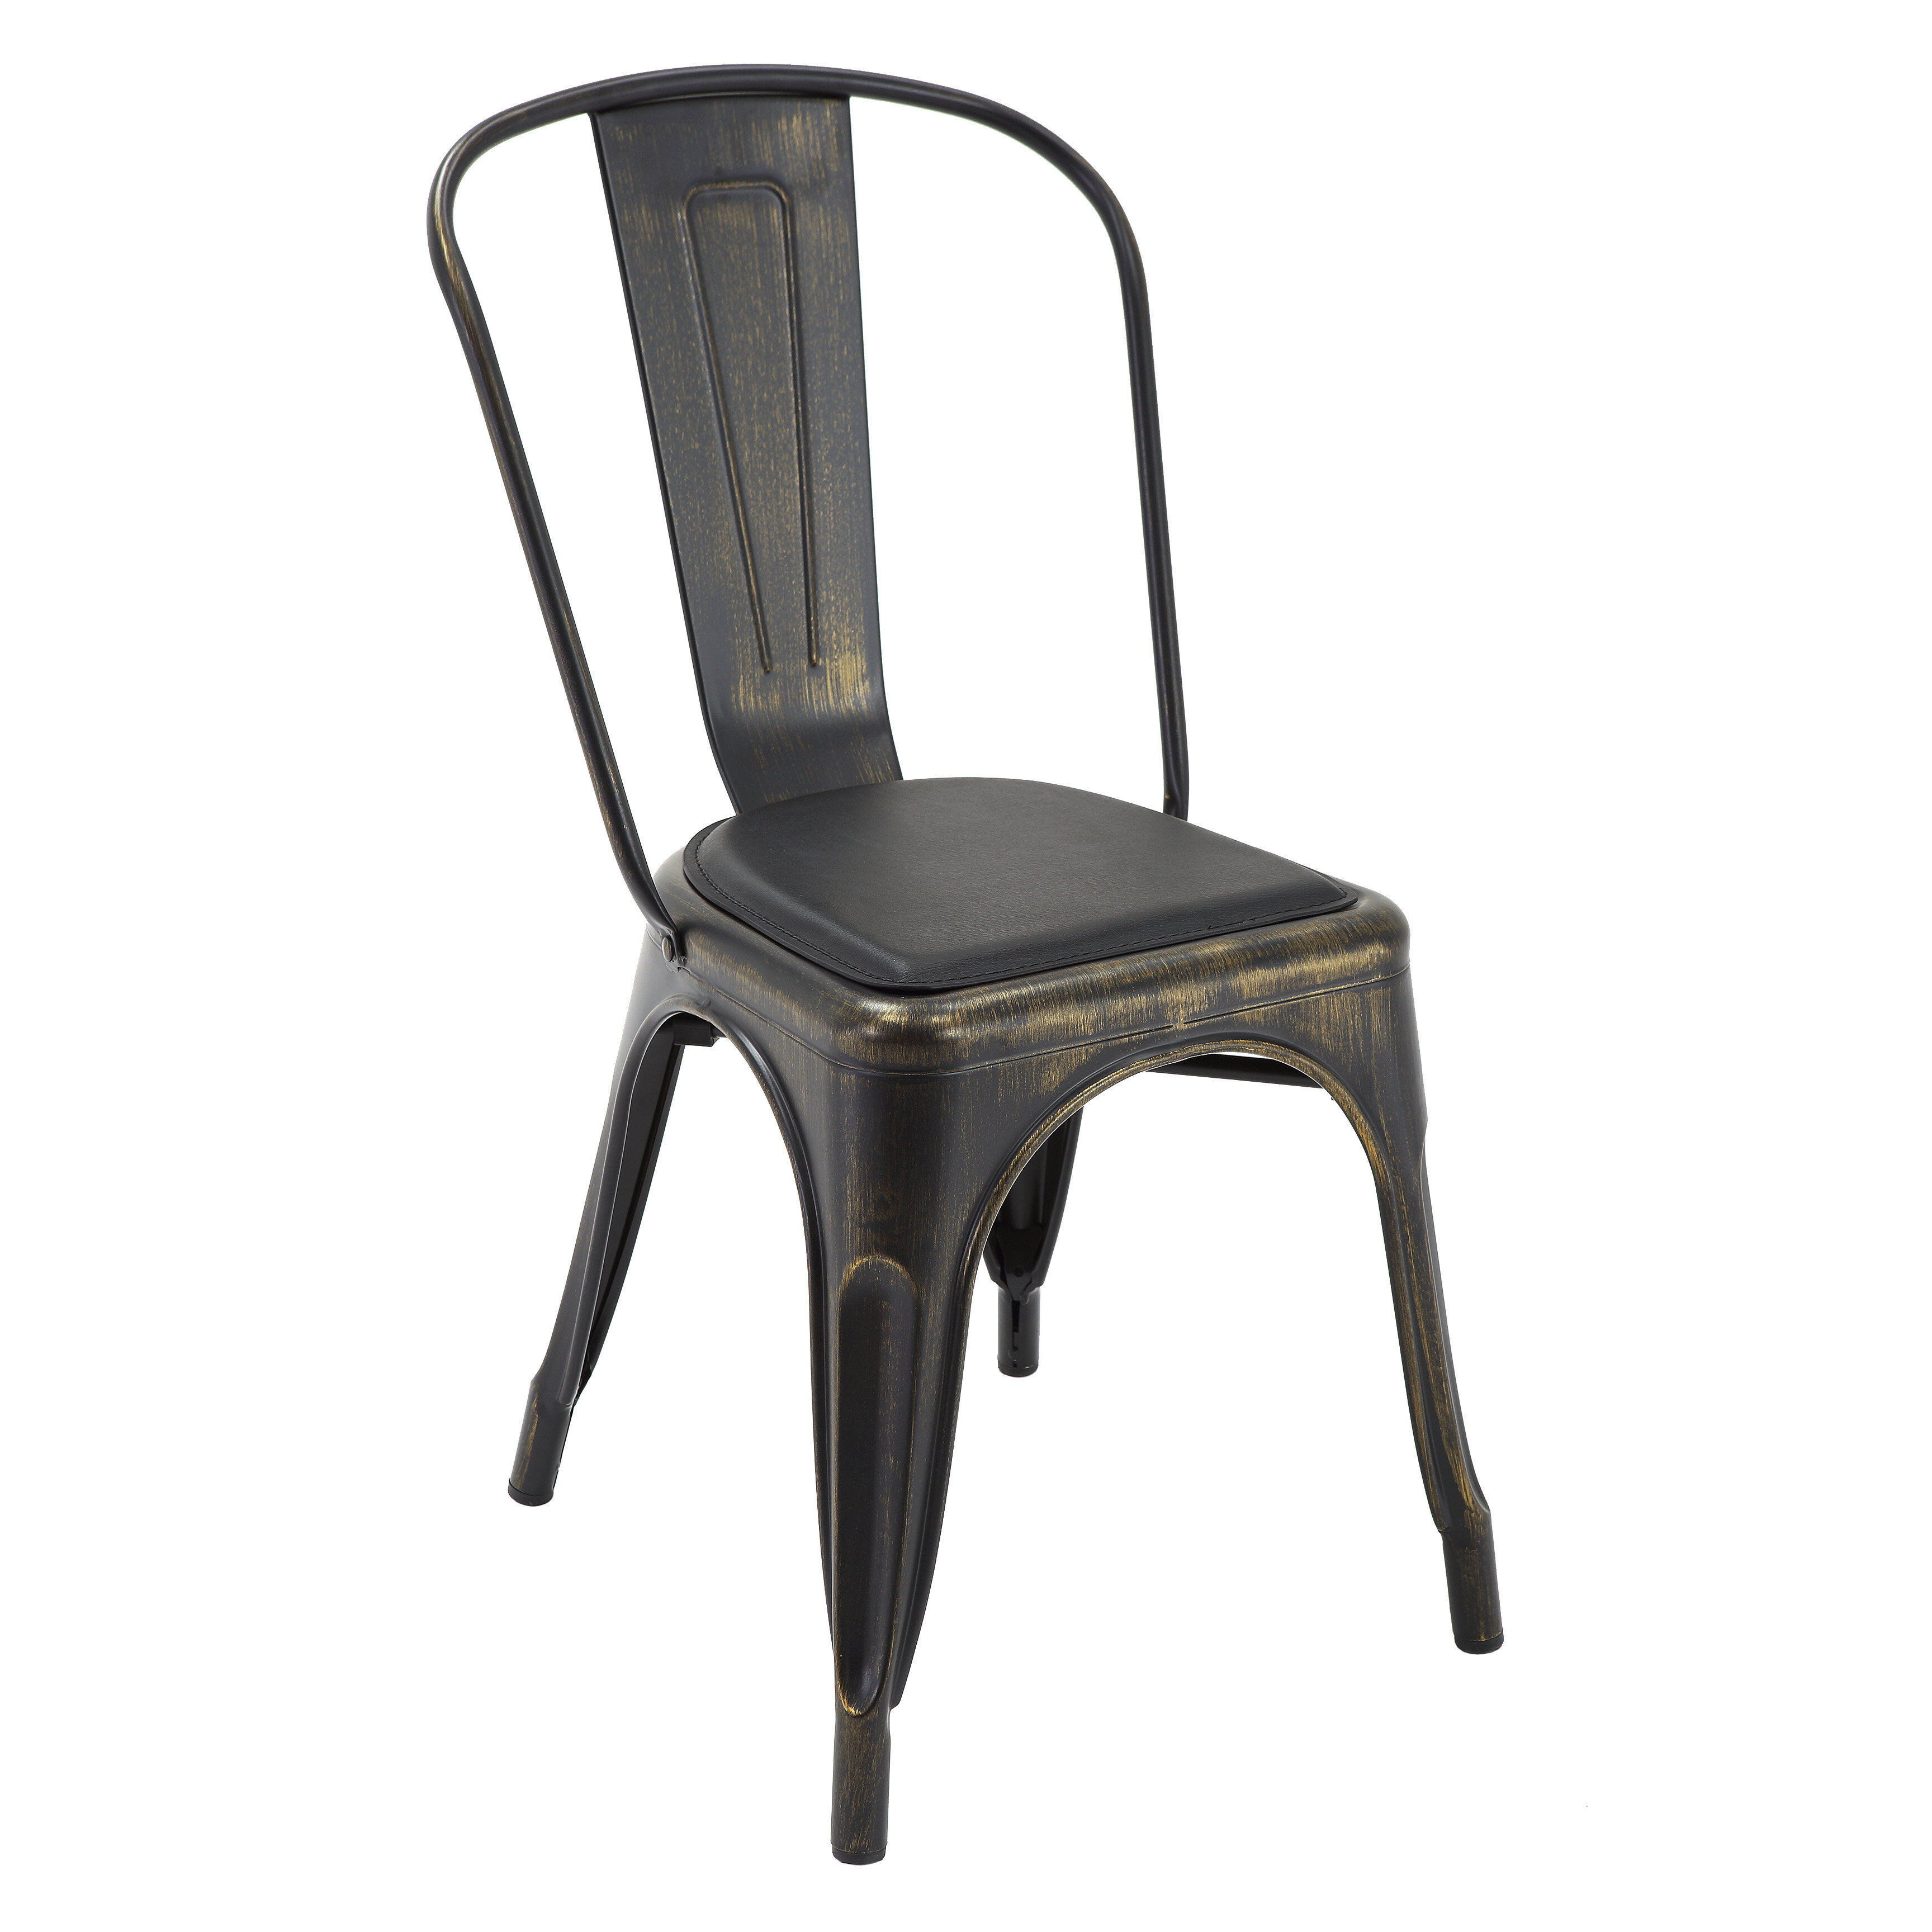 Prime Dining Chair Cushion Beatyapartments Chair Design Images Beatyapartmentscom